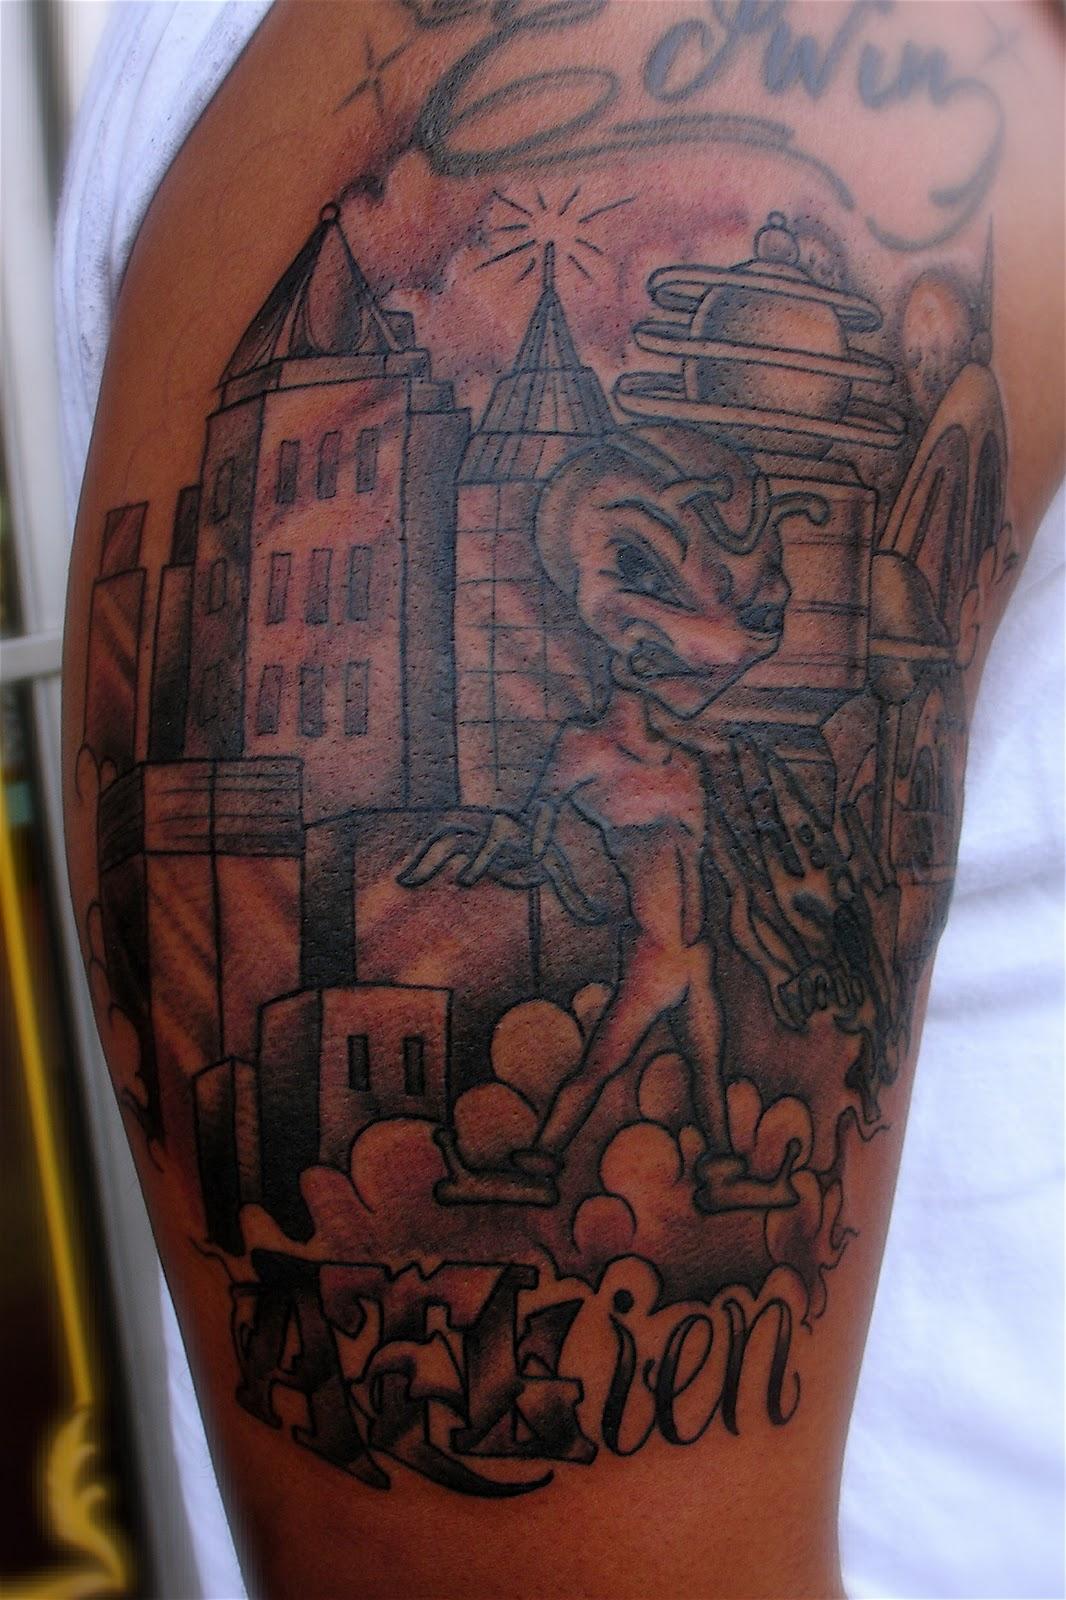 Liberty Tattoo Atlanta: 11/21/10 - 11/28/10